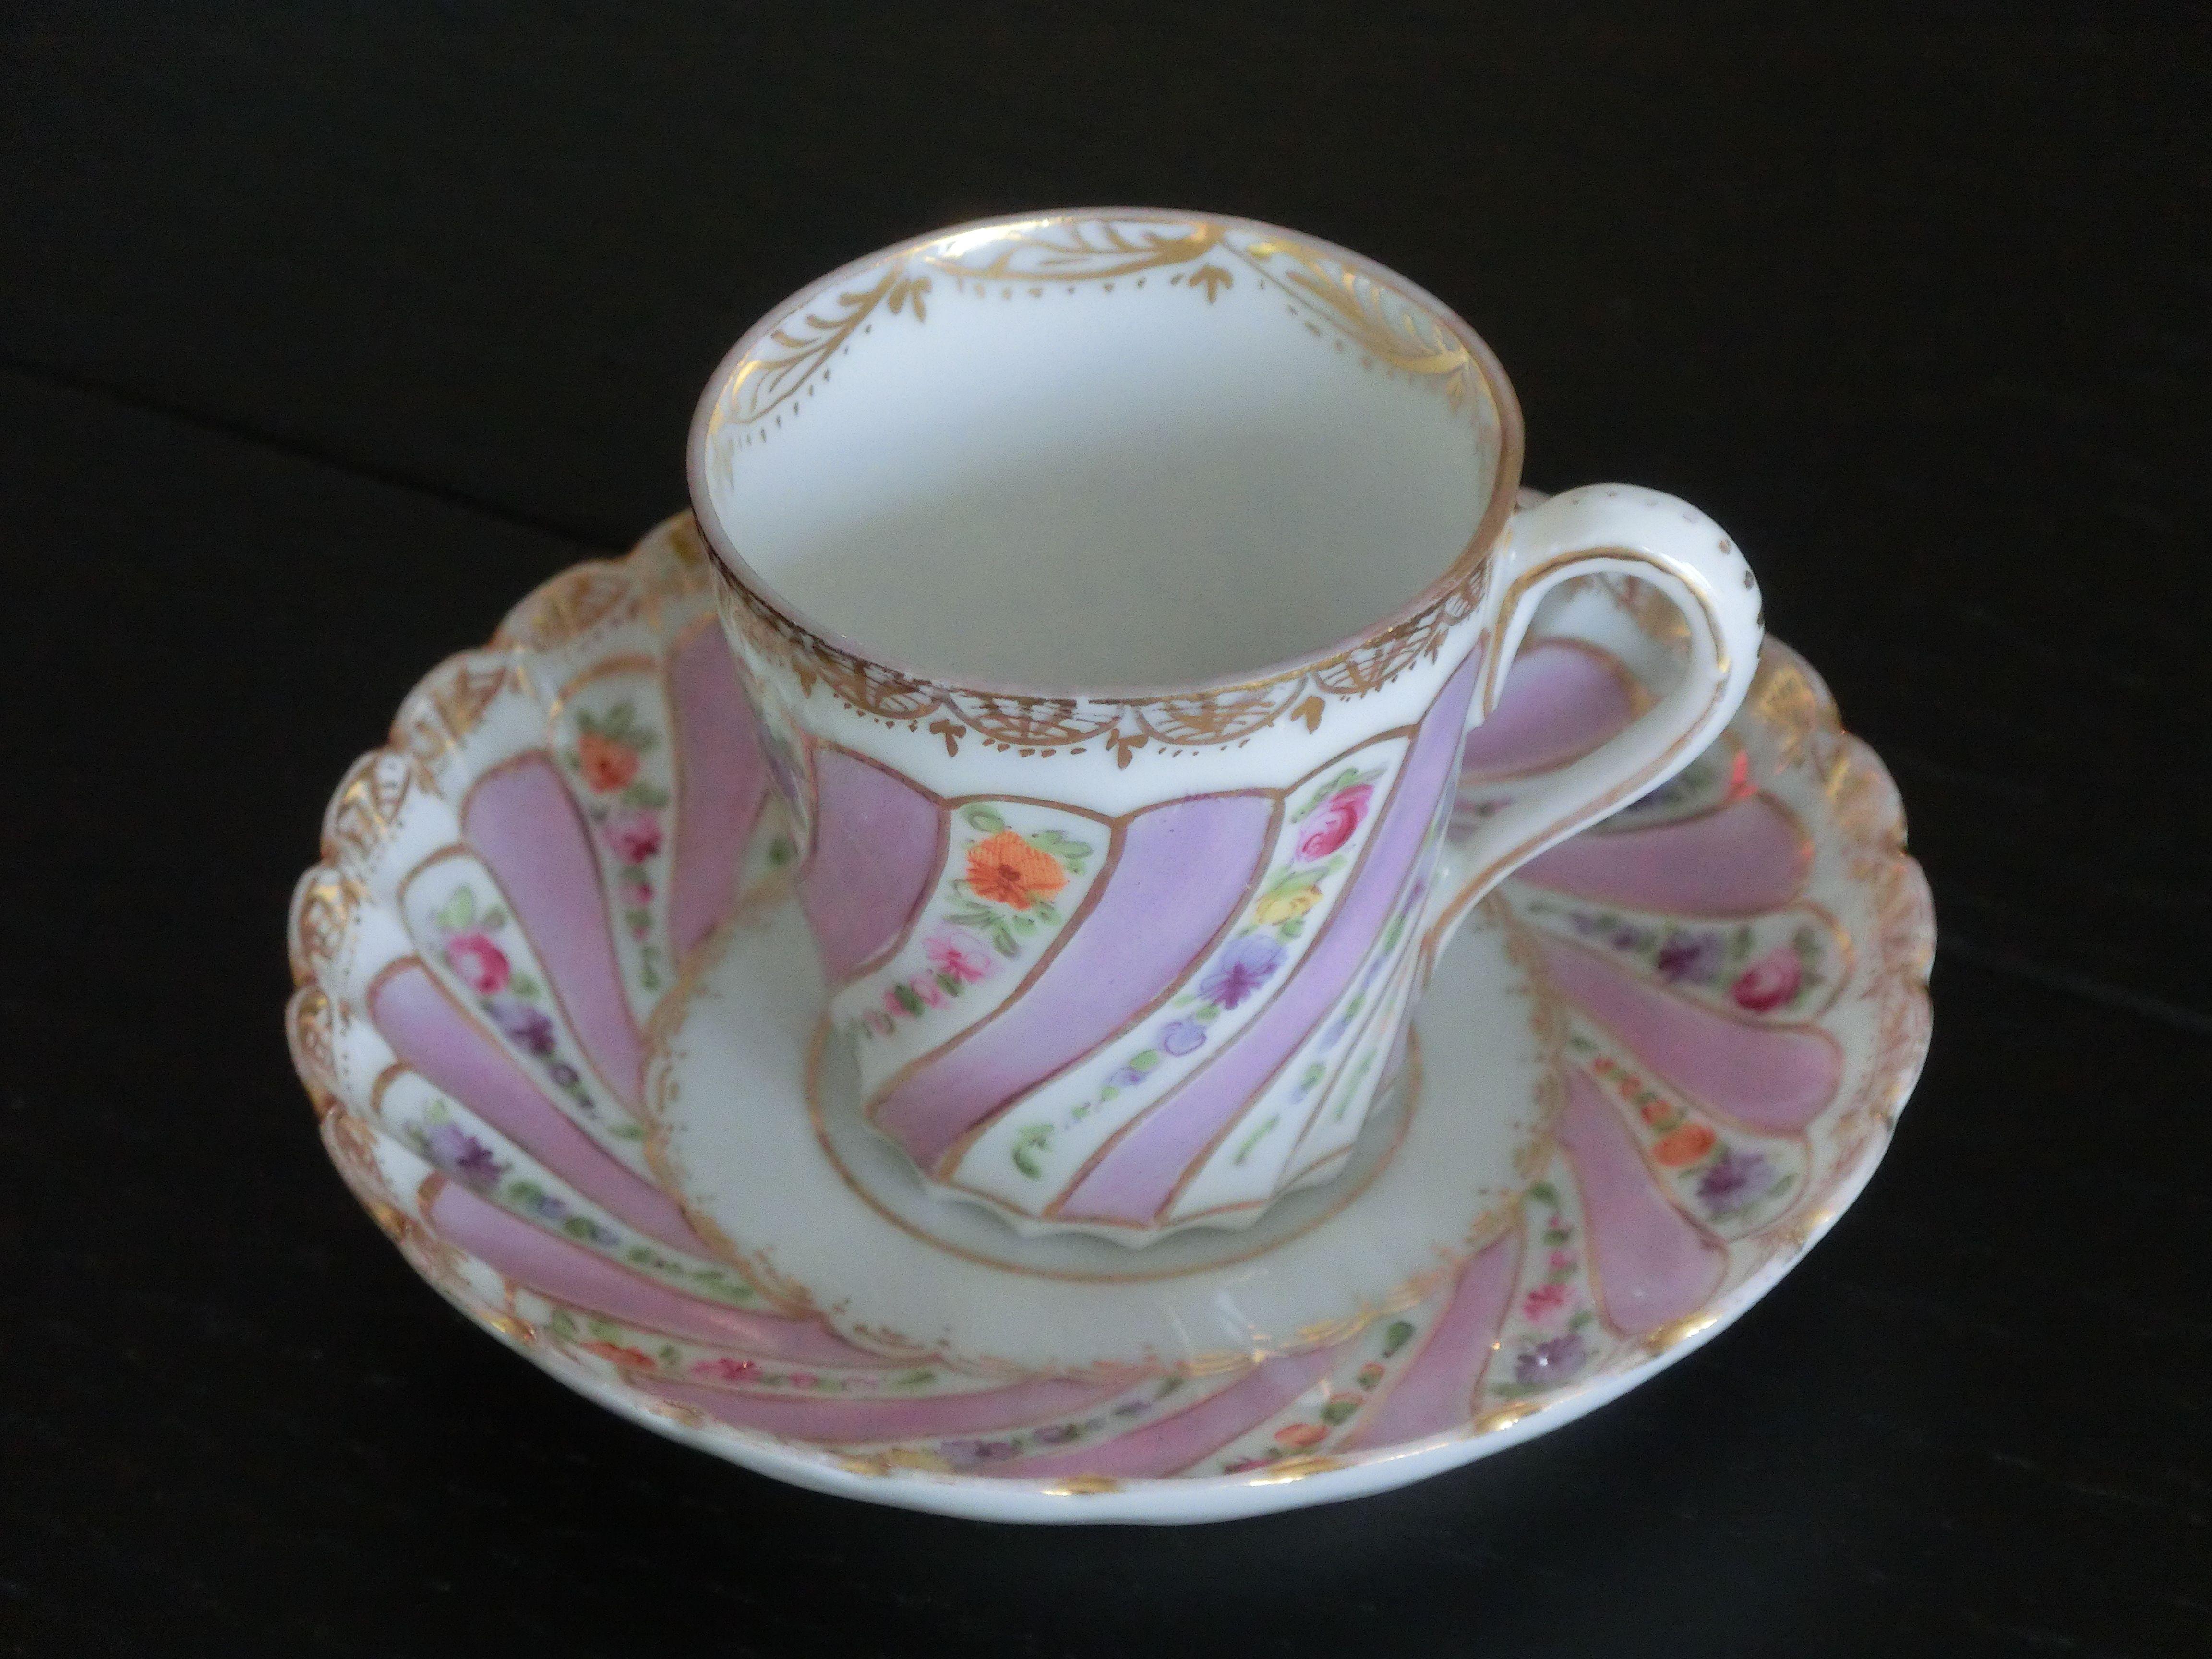 helena wolfsohn dresden germany 1843 1878 teapot cup teatime pinterest. Black Bedroom Furniture Sets. Home Design Ideas